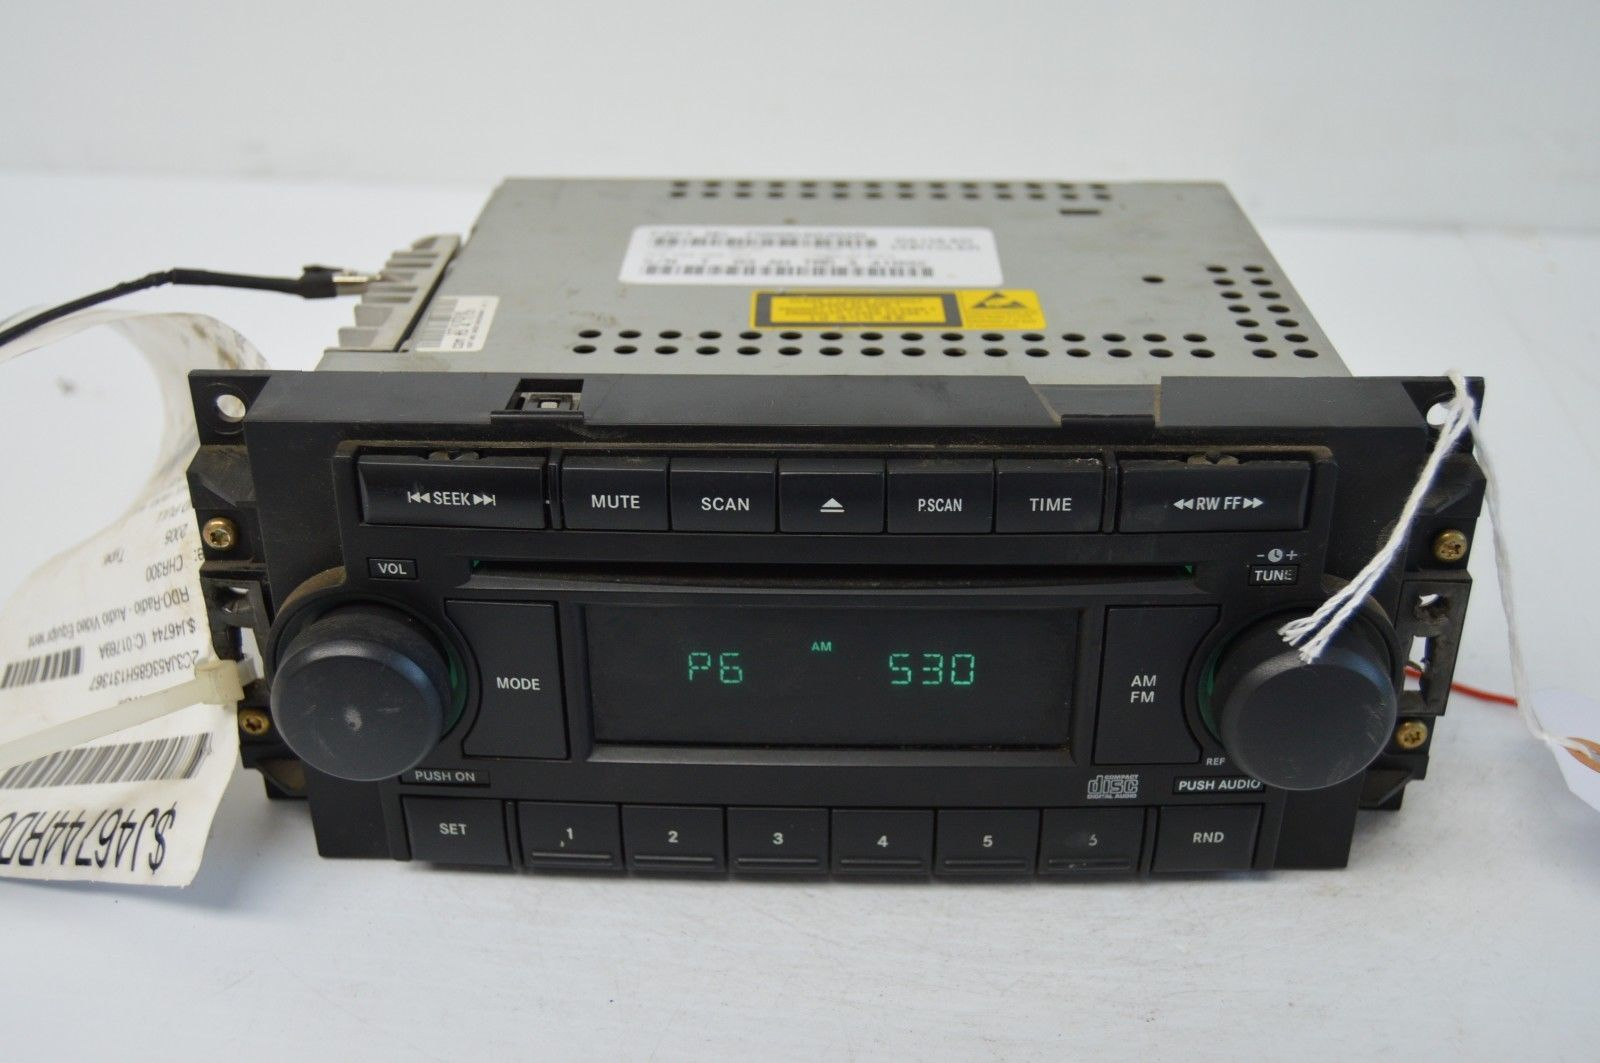 2005-2010 CHRYSLER 300 RADIO CD PLAYER OEM RADIO P05064030AN TESTED H61#030